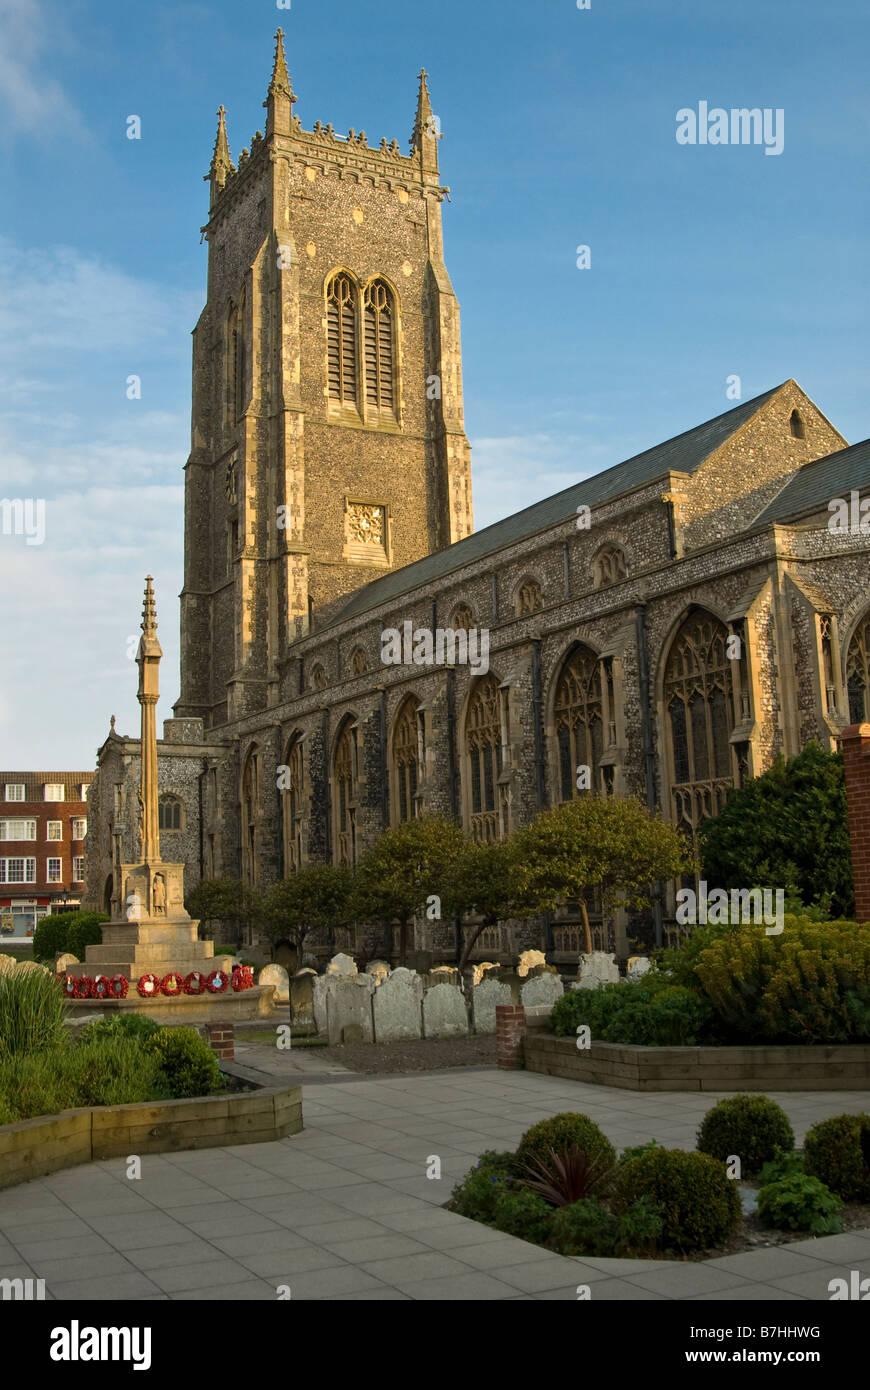 Die Pfarrkirche St. Peter und St. Paul in Cromer, Norfolk, England, UK. Stockbild